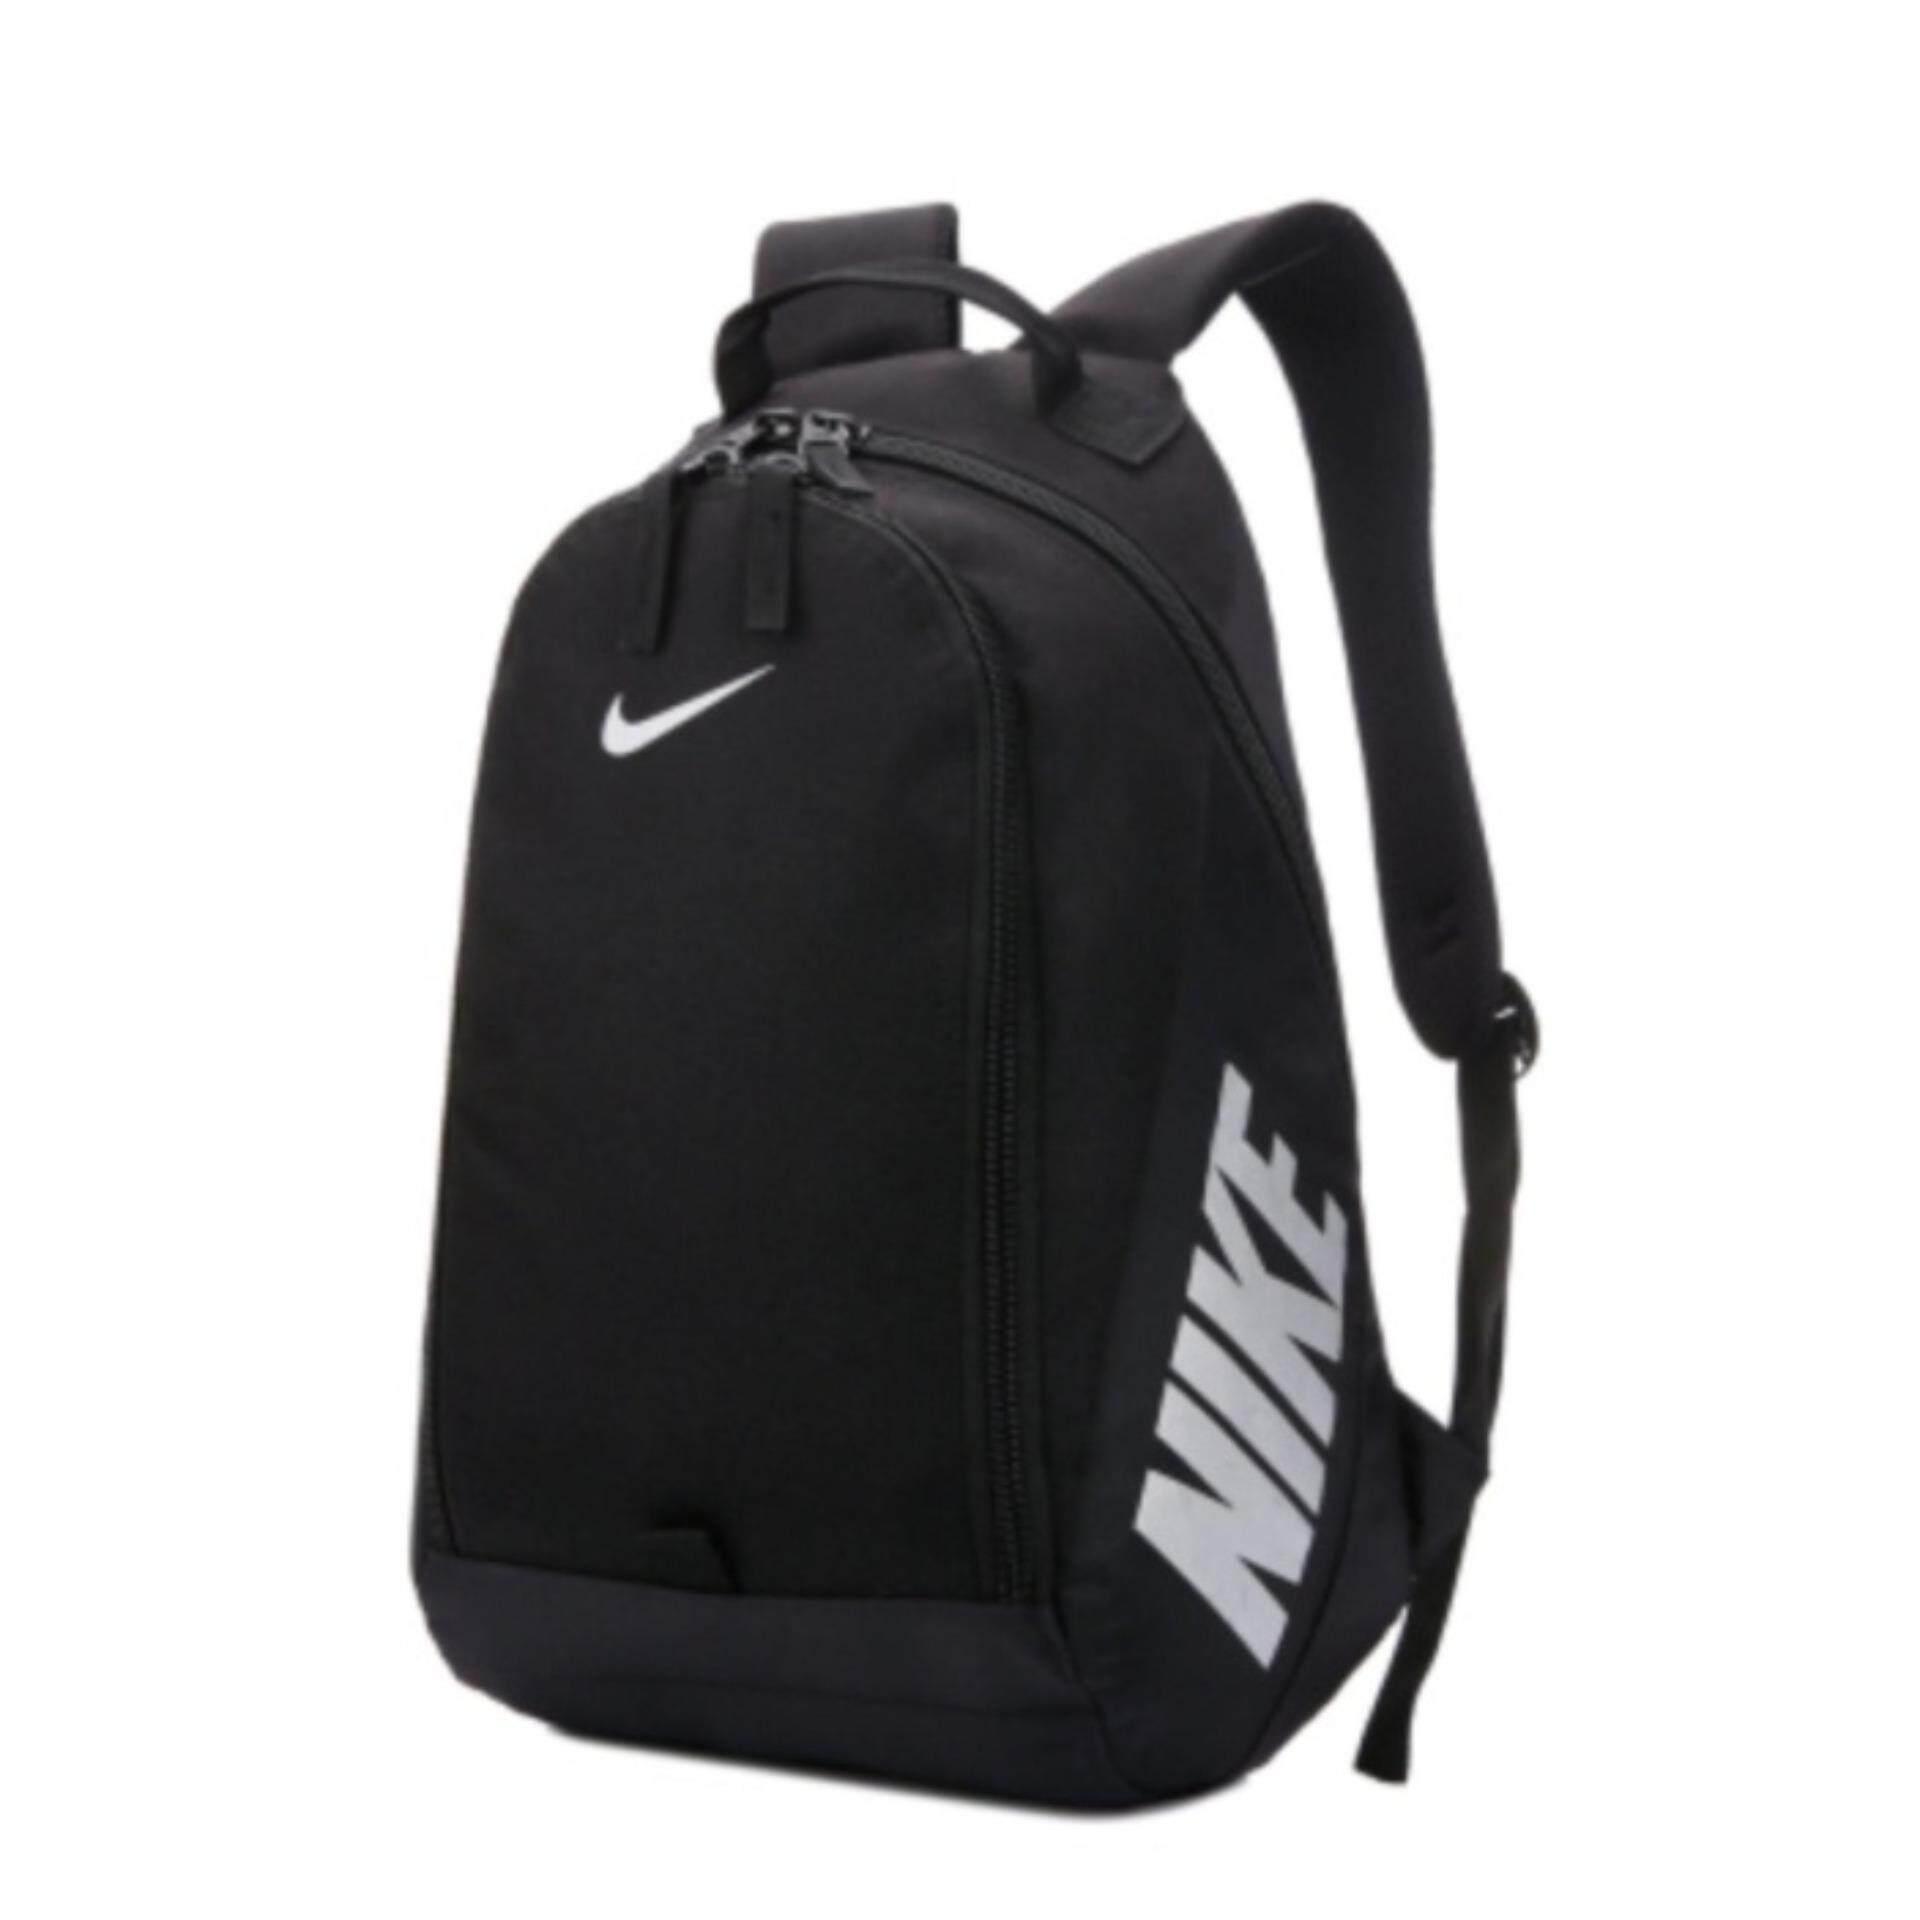 b2ae203e49 NEW ARRIVAL!!  NIKE  School Backpacks  Laptop Backpack  Shoulder Bag